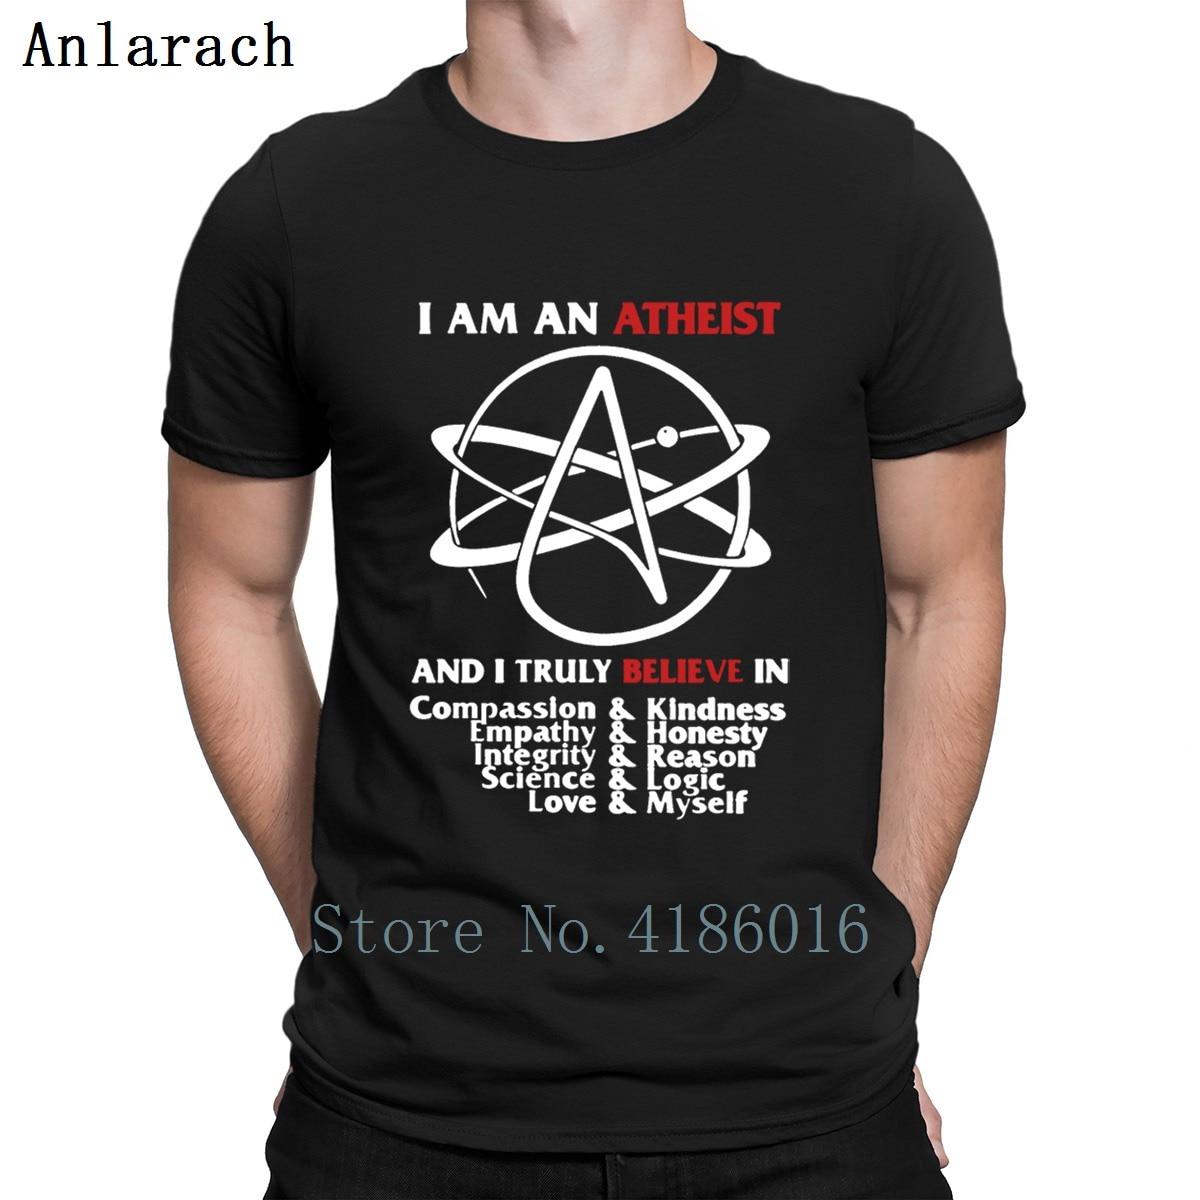 Soy un ateo T Shirt Vintage impresión edificio manga corta verano O cuello lindo camisas de caballeros